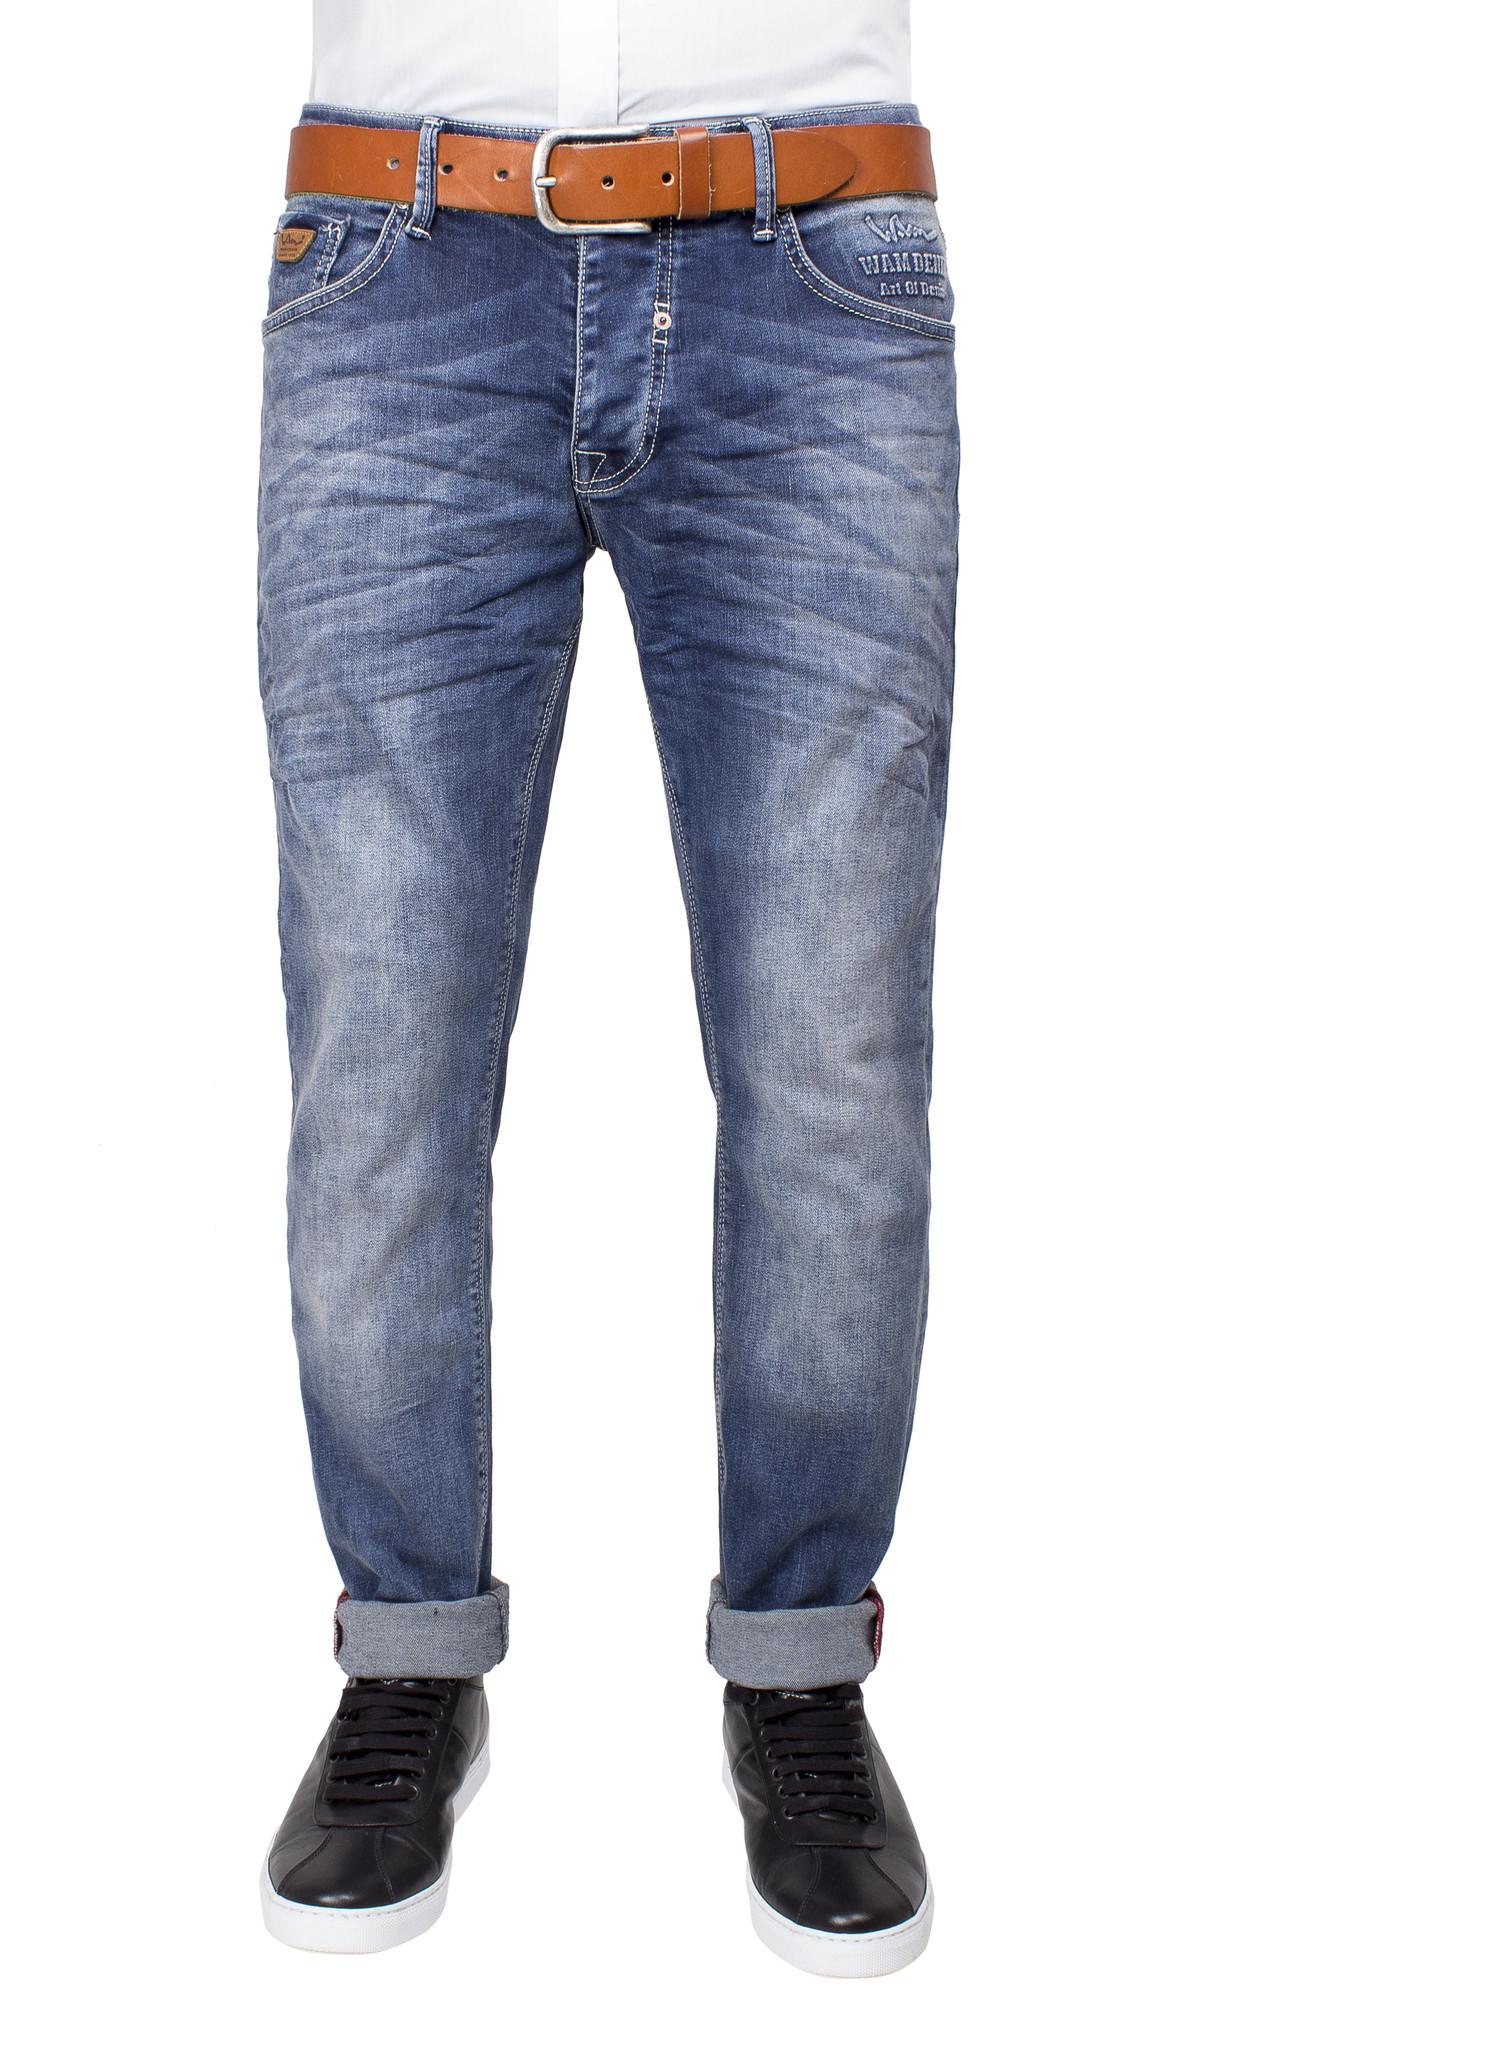 Wam Denim Jeans 72053 Blue